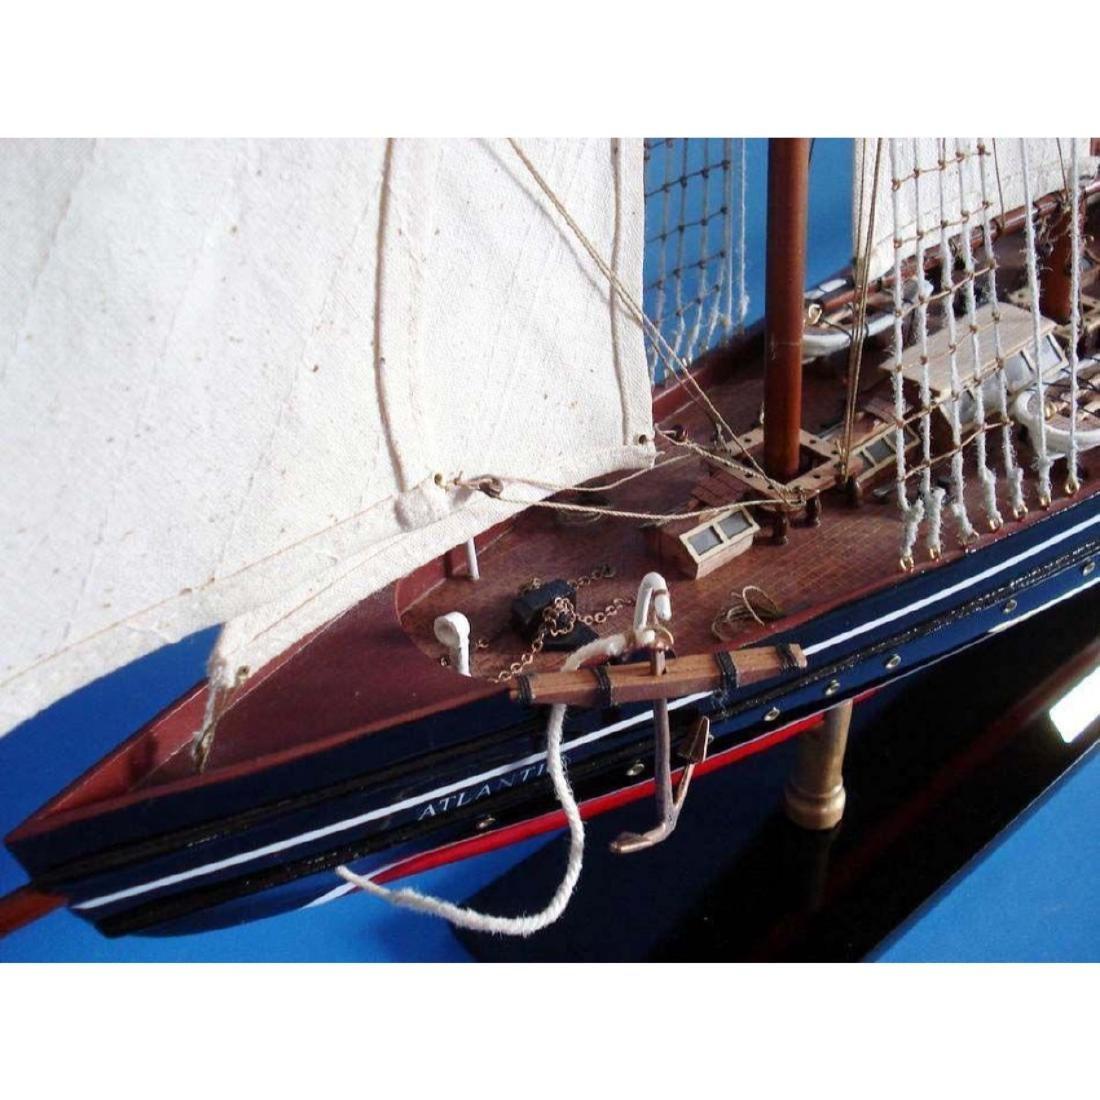 "Wooden Atlantic Limited Model Sailboat 32"" - 9"